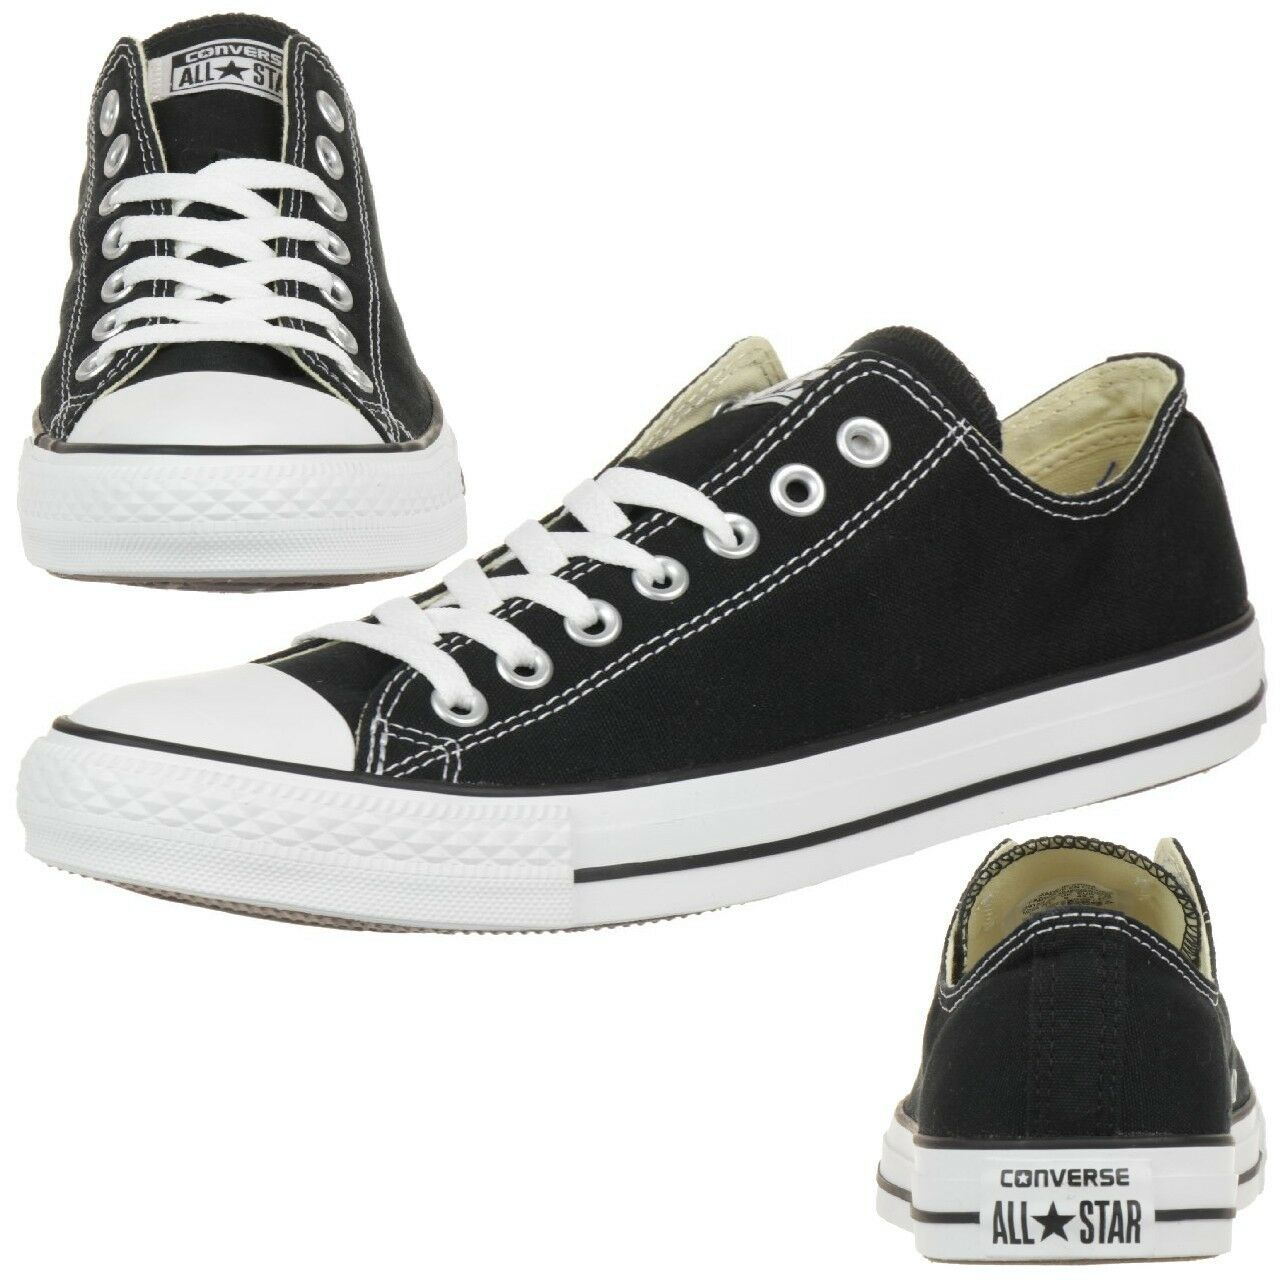 Converse CT ALL Star Chucks OX Schuhe Sneaker M9166C black